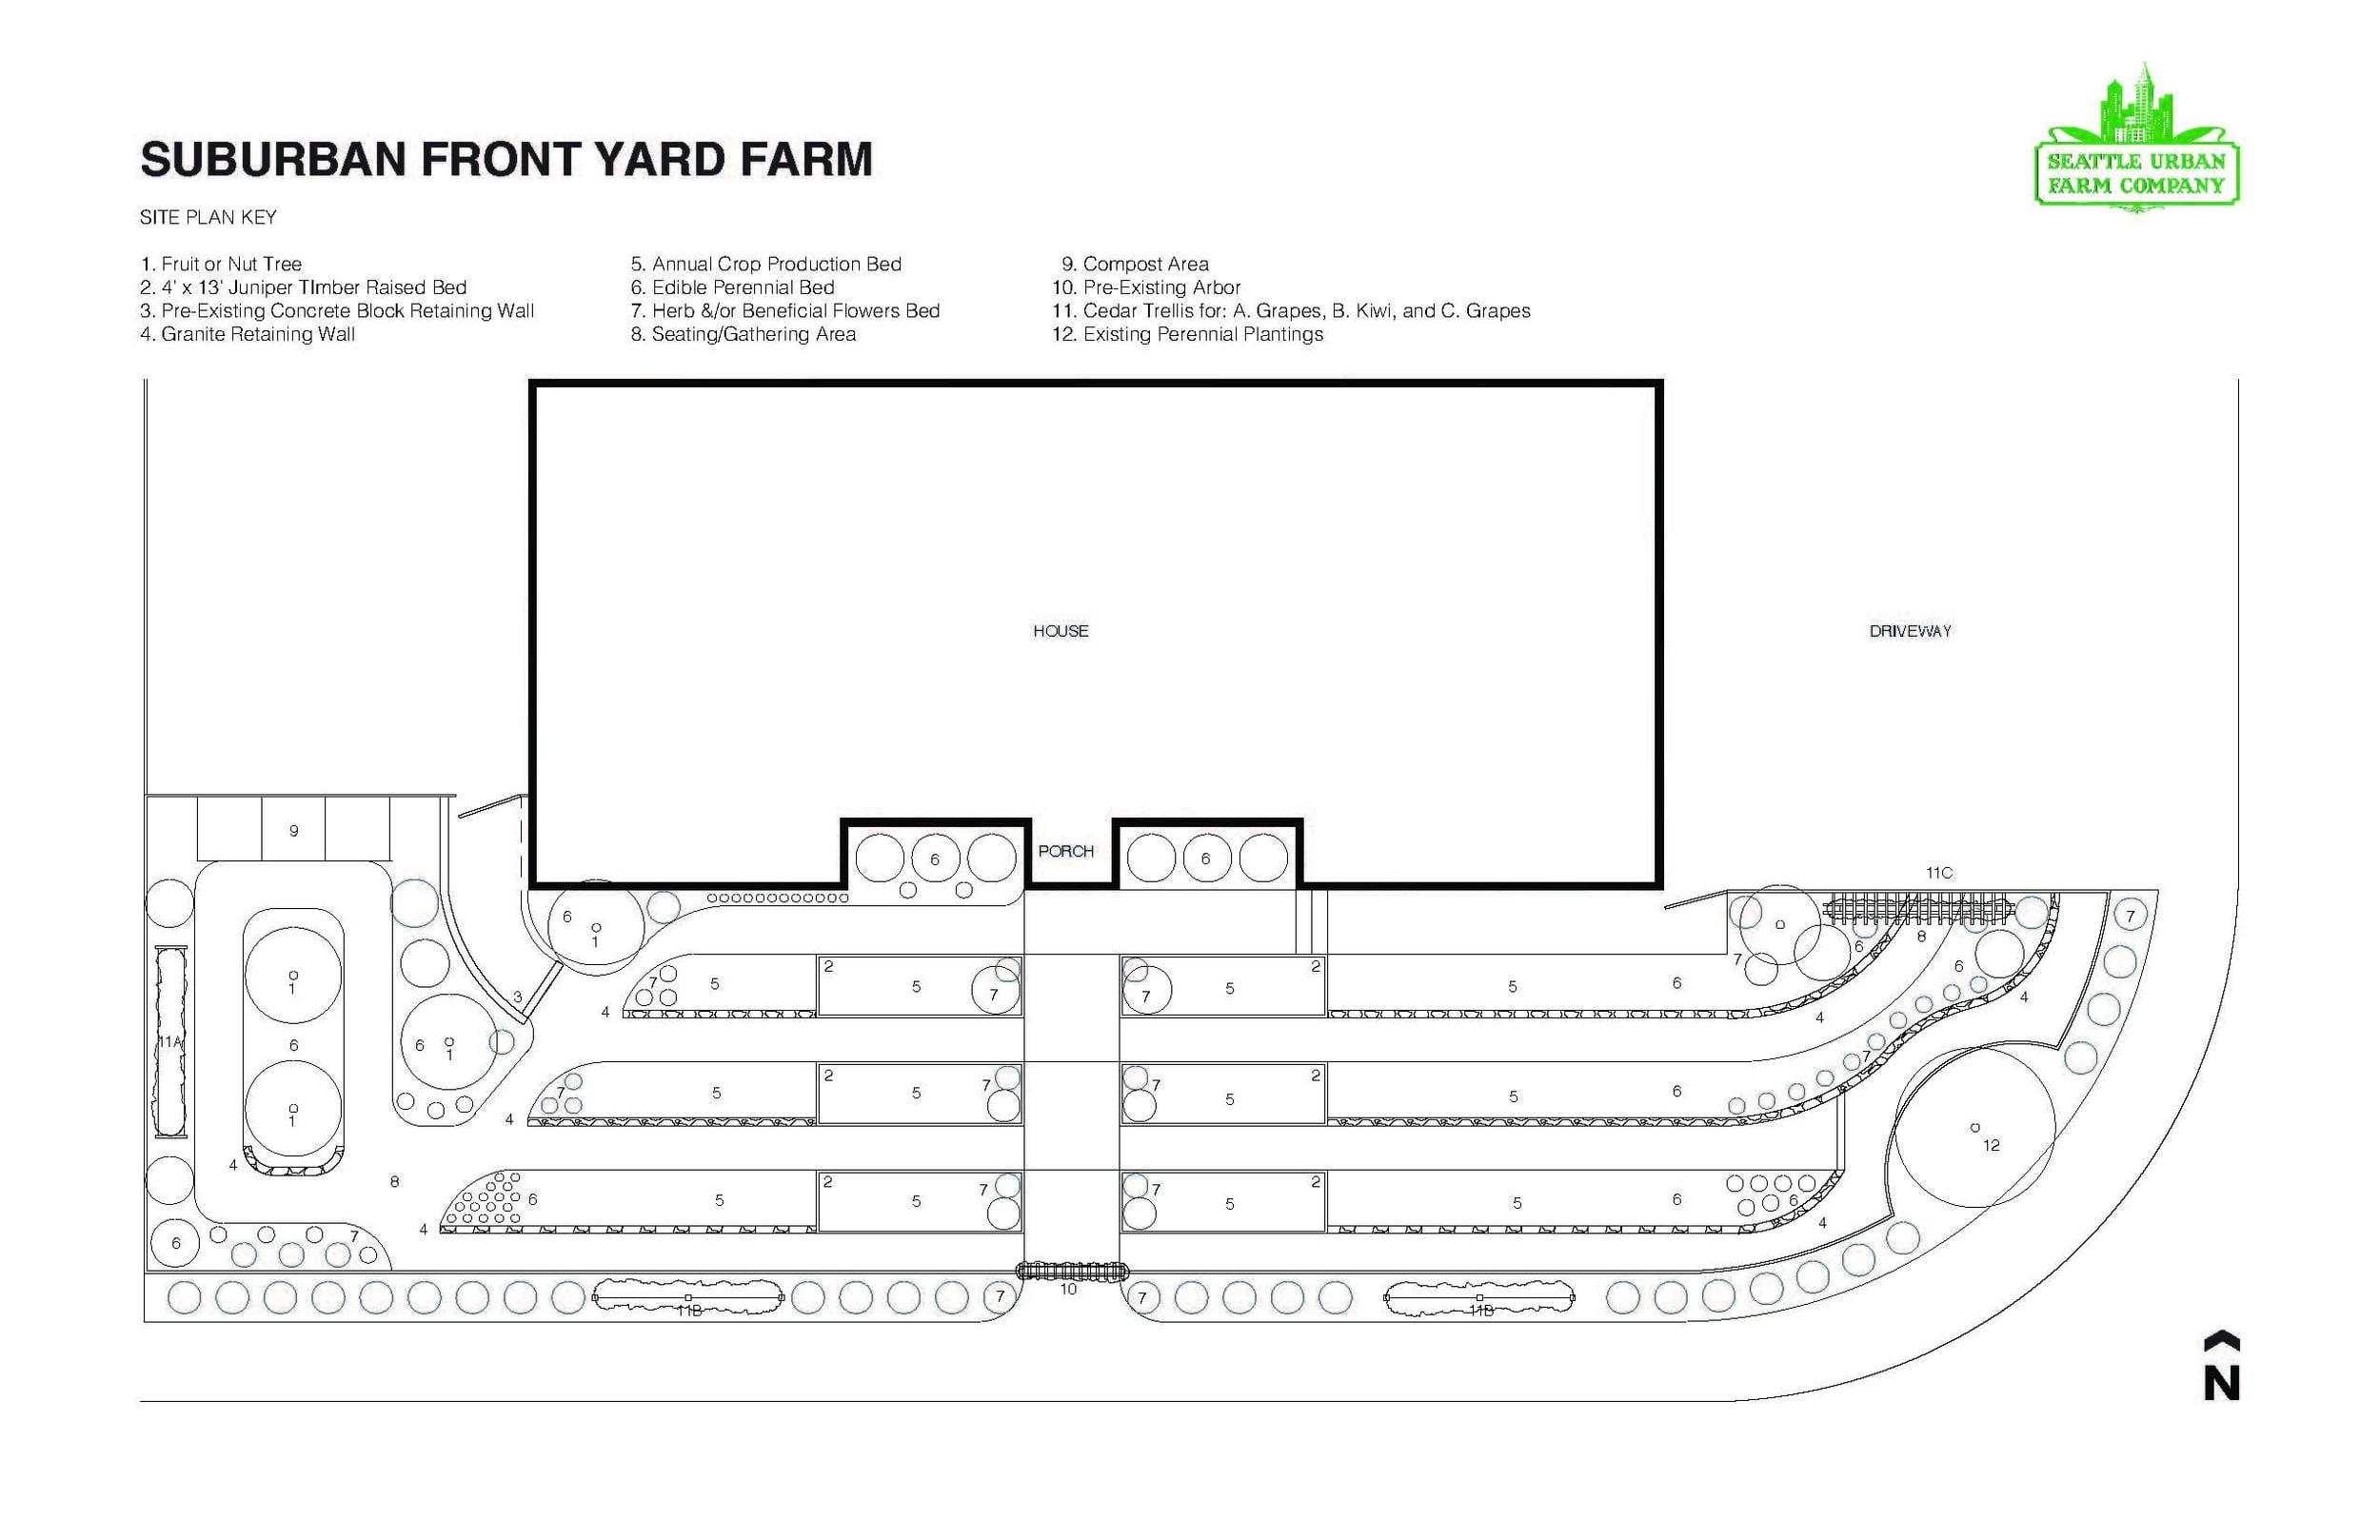 Suburban Front Yard Farm_Seattle Urban Farm Co.